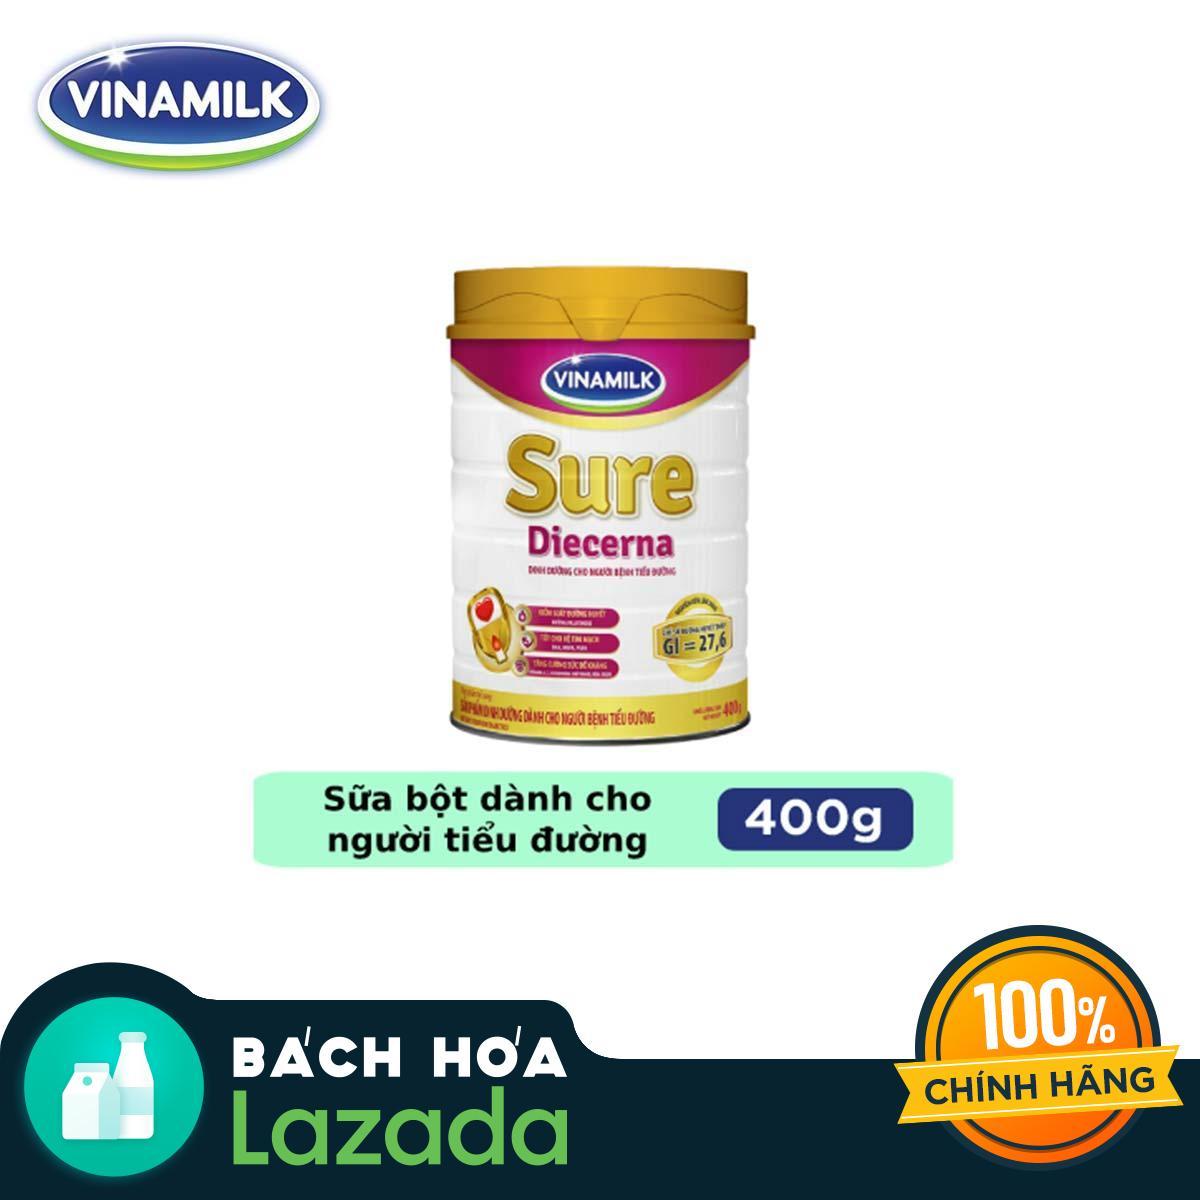 Sữa bột Vinamilk Sure Diecerna - Hộp Thiếc 400g